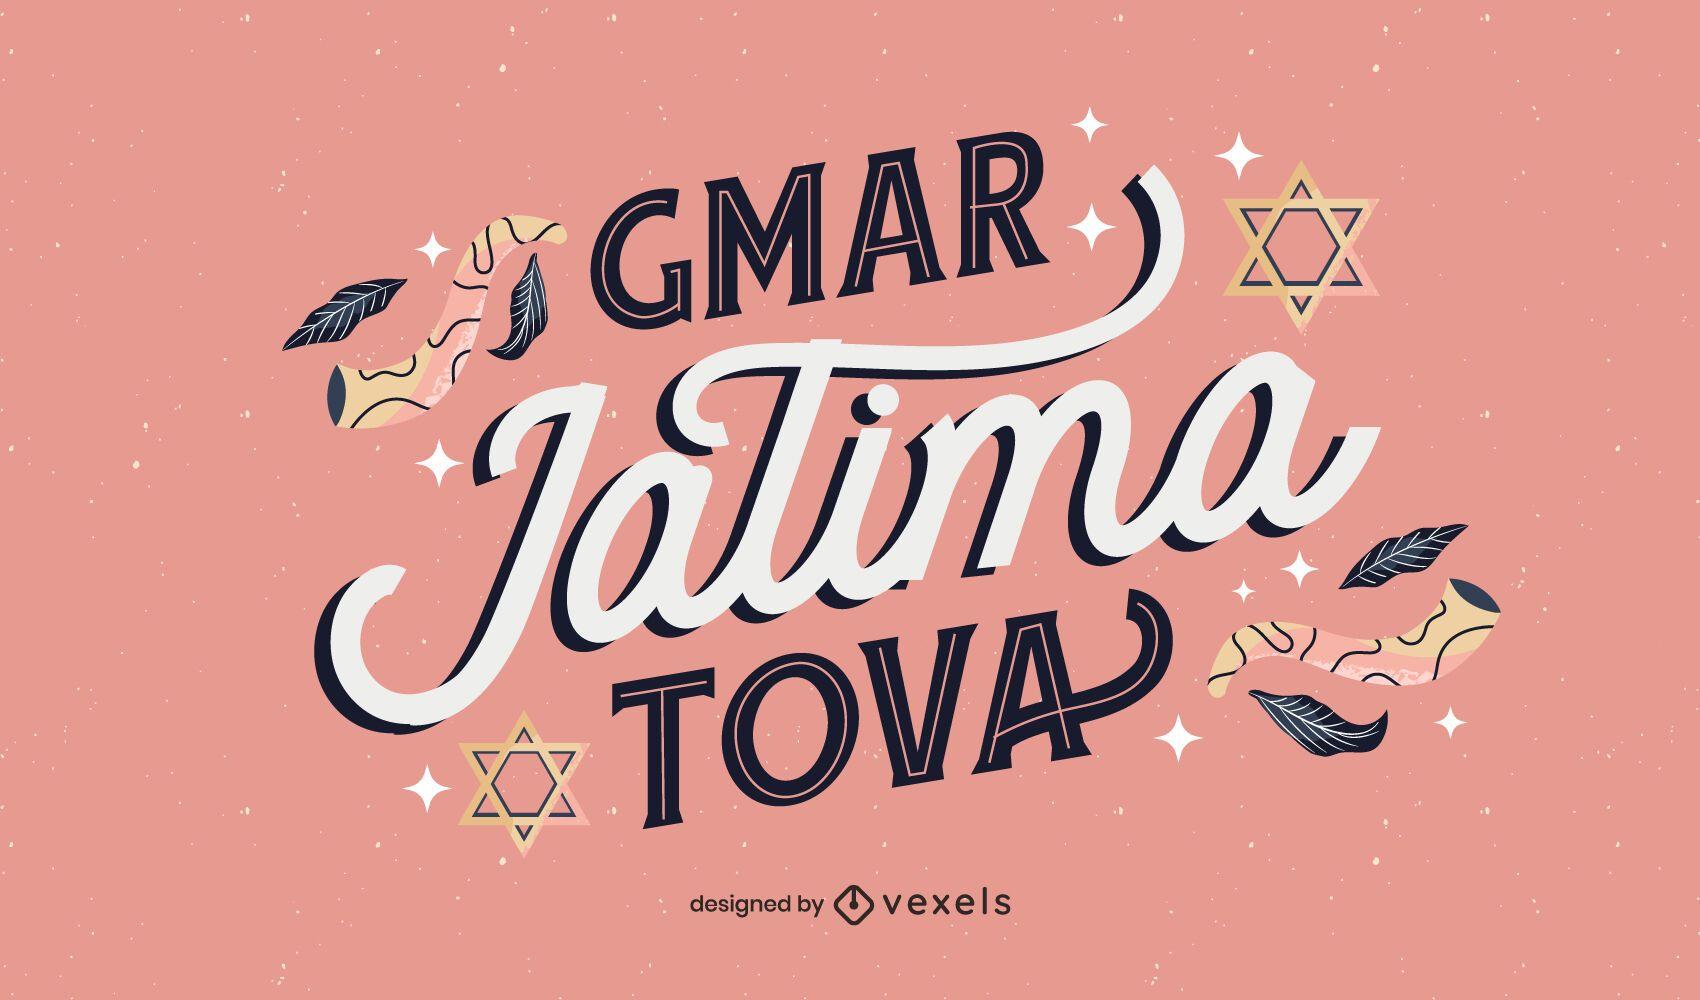 Diseño de letras gmar jatima tova